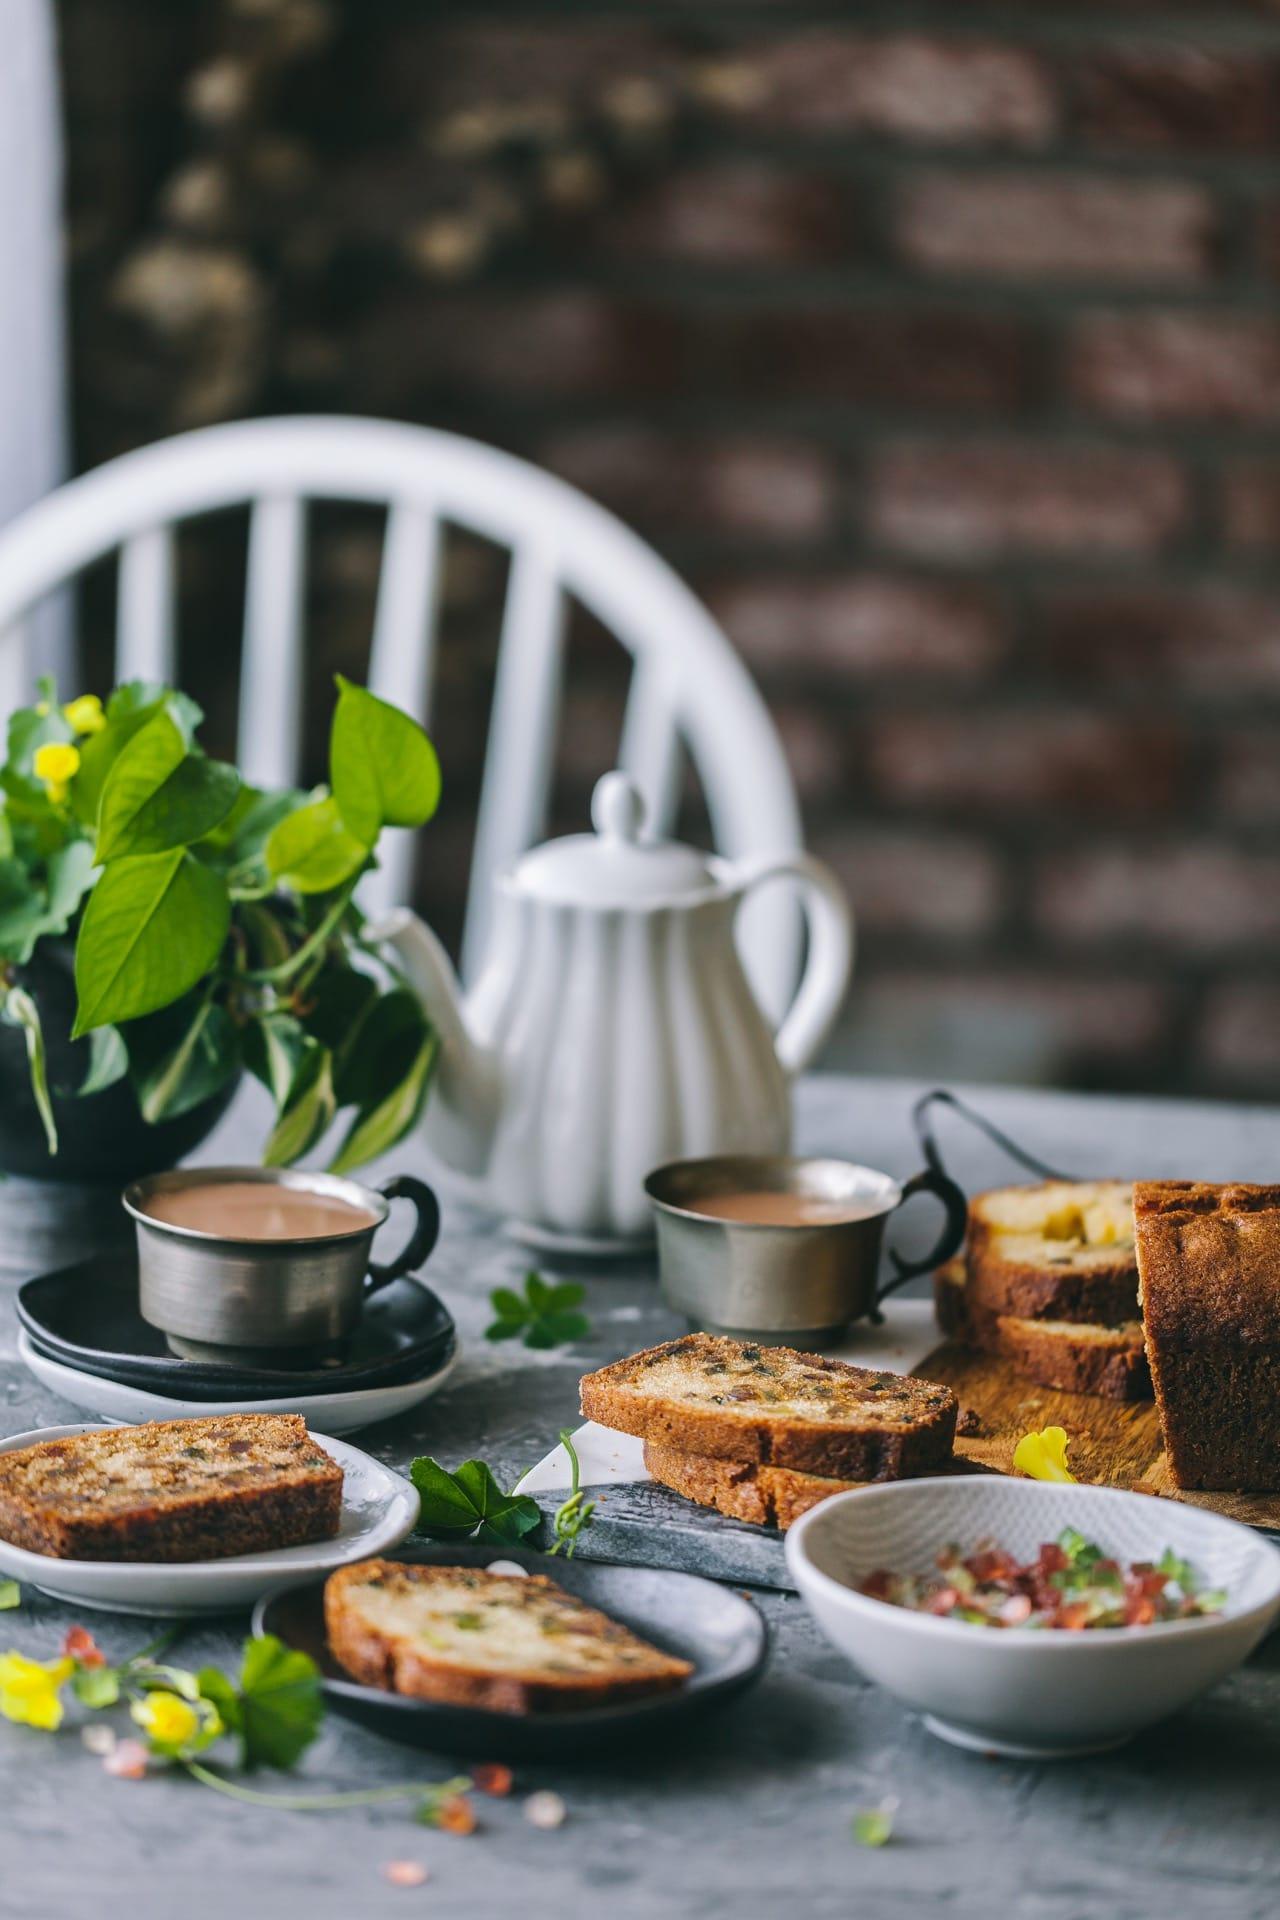 Tutti Frutti Cake | Playful Cooking #cake #teatimecake #tuttifrutti #cake #loafcake #easycake #foodphotography #foodstyling